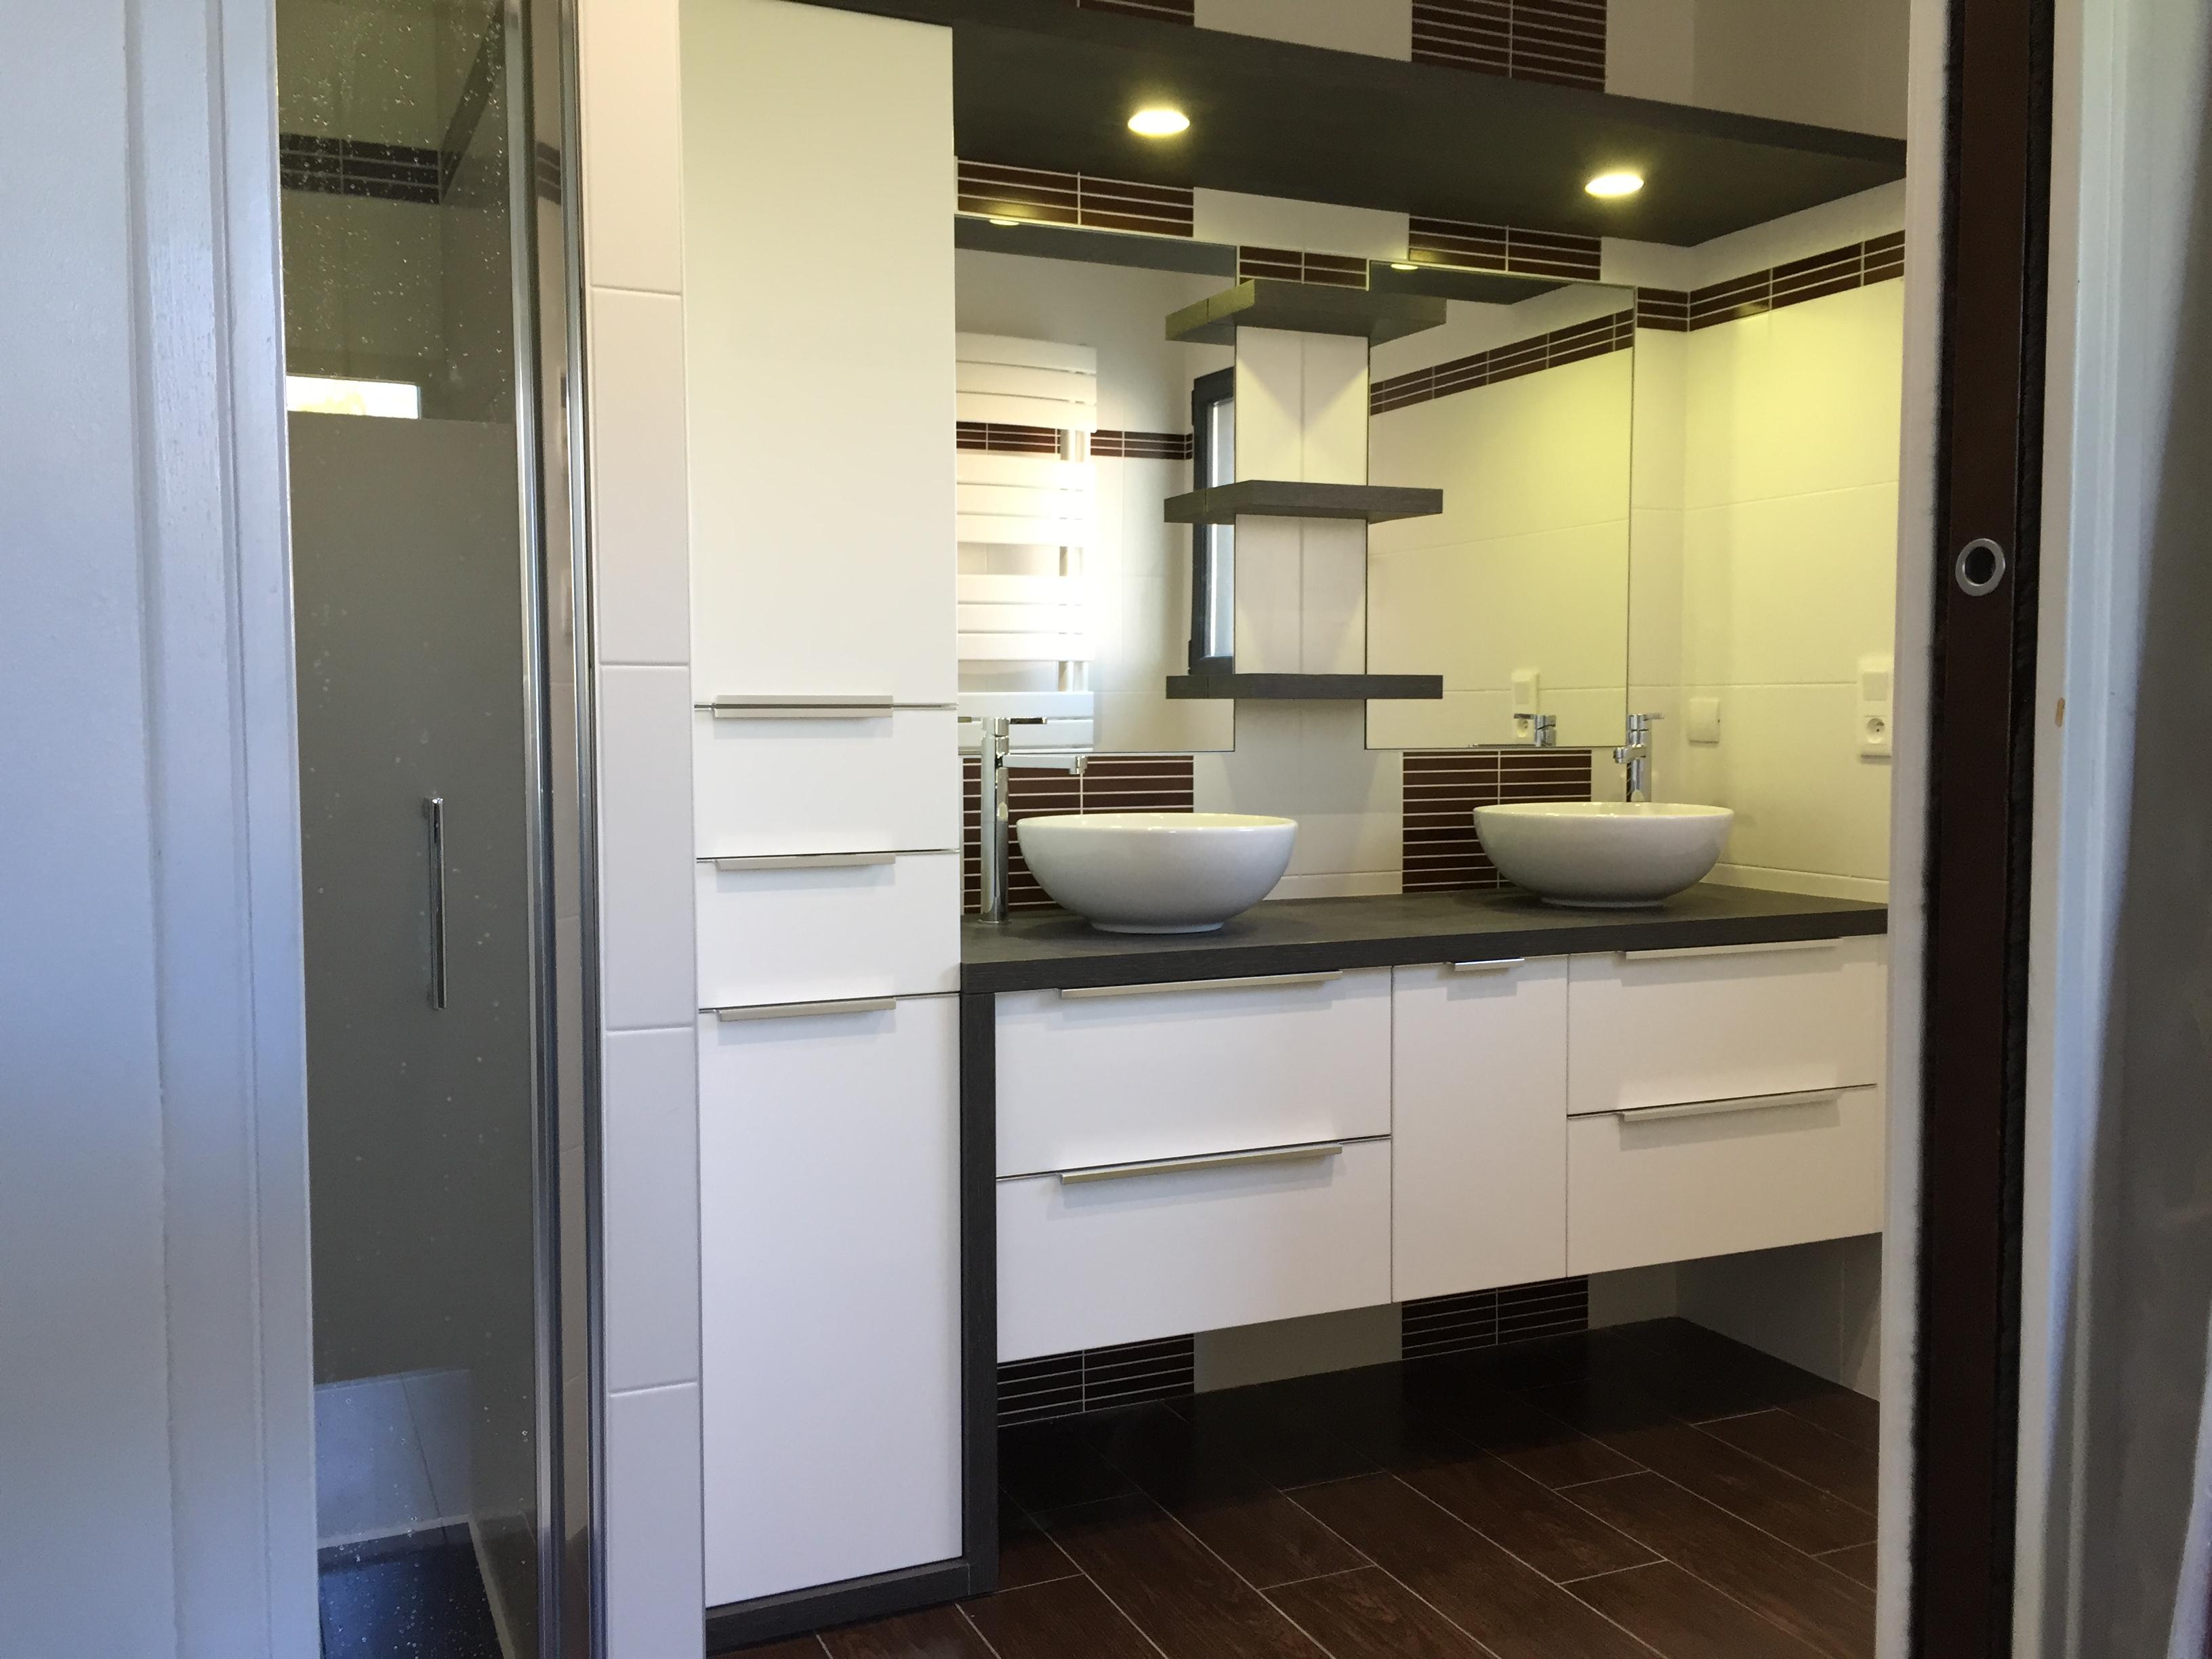 Meuble de salle de bains avec eclairage integré